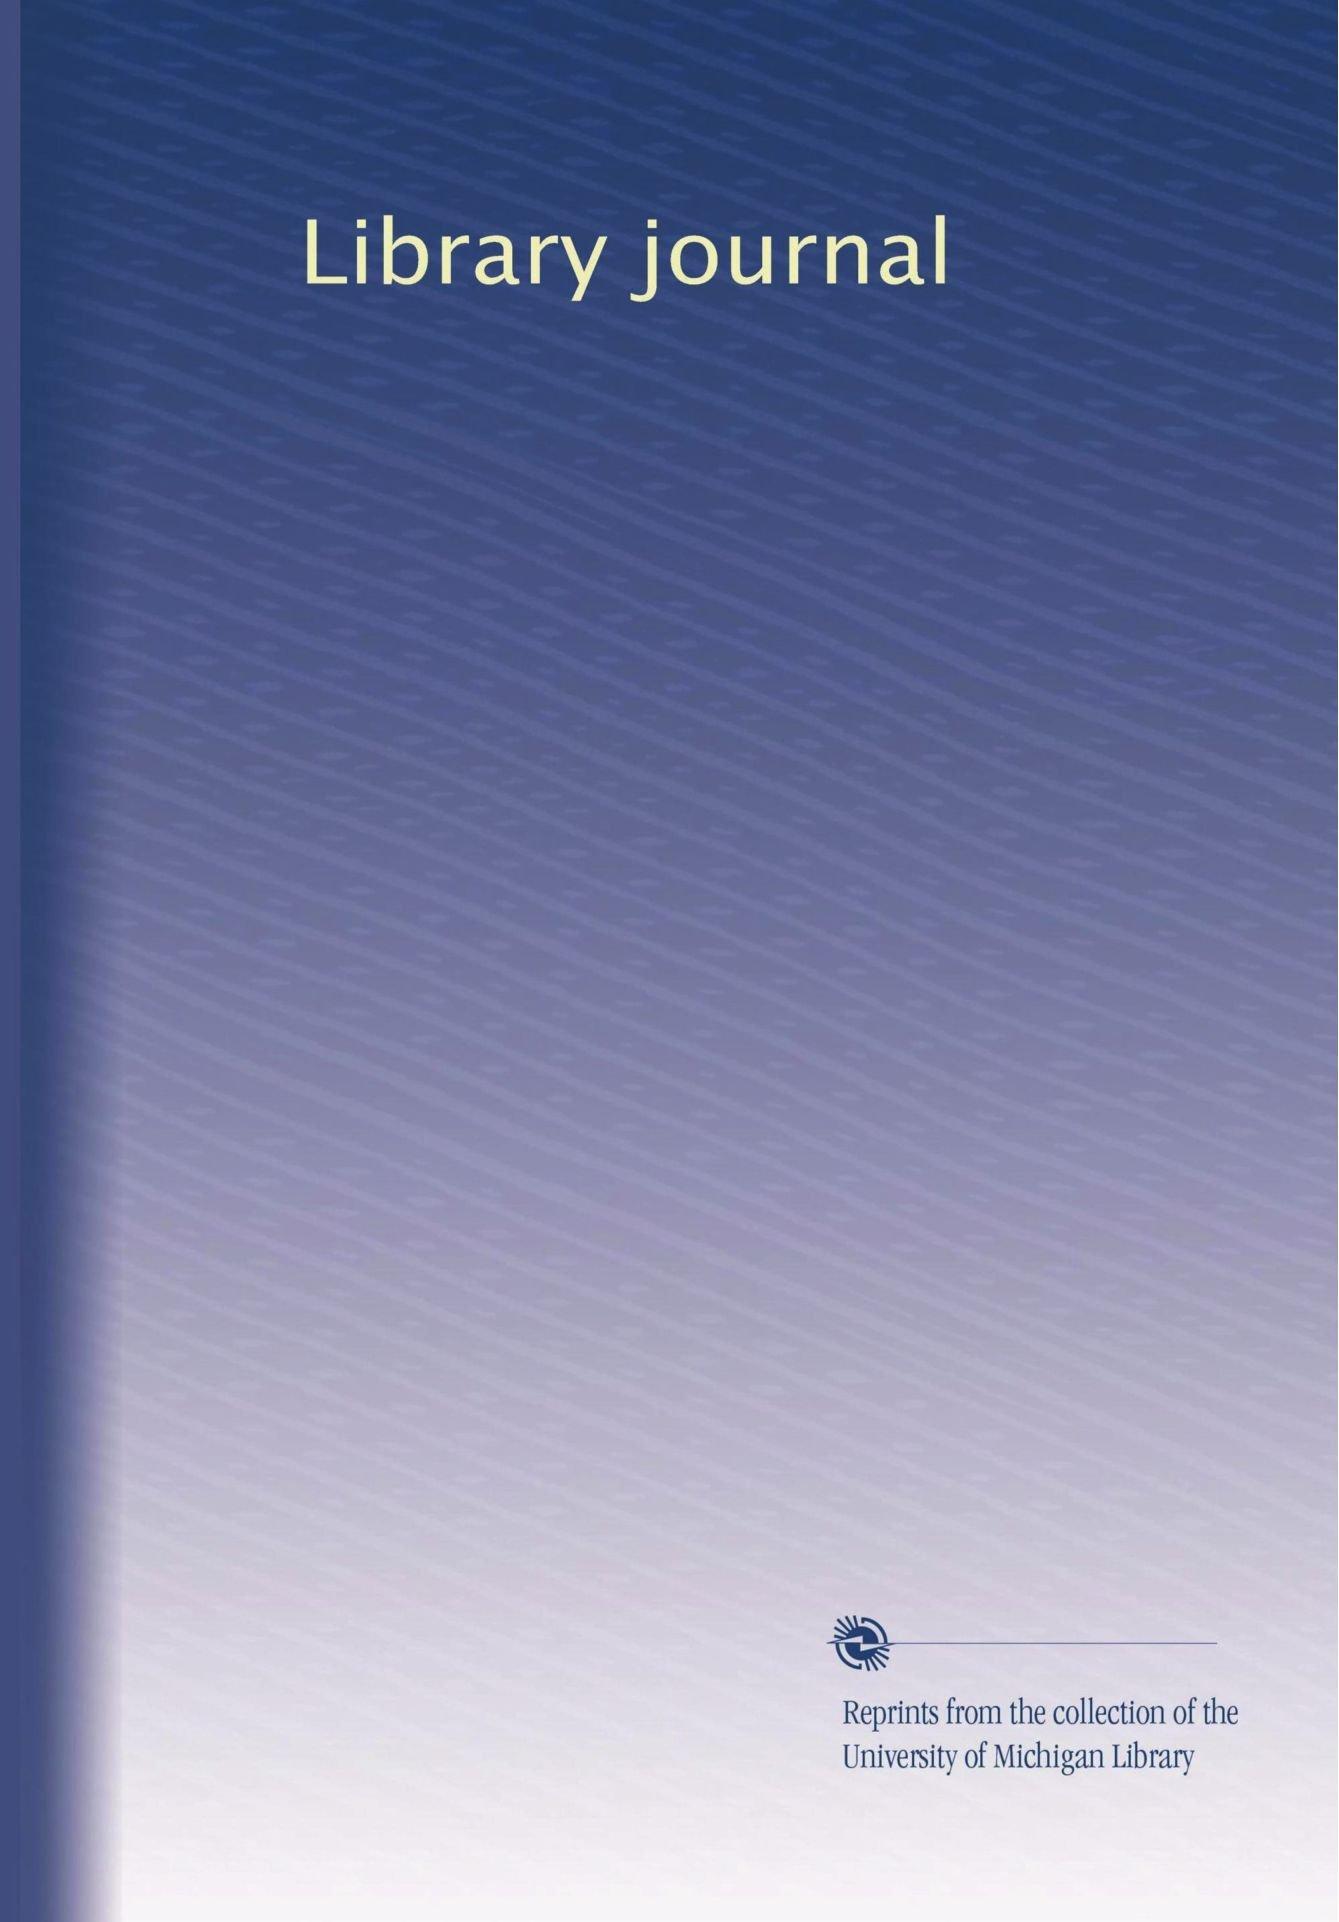 Download Library journal (Volume 20) PDF